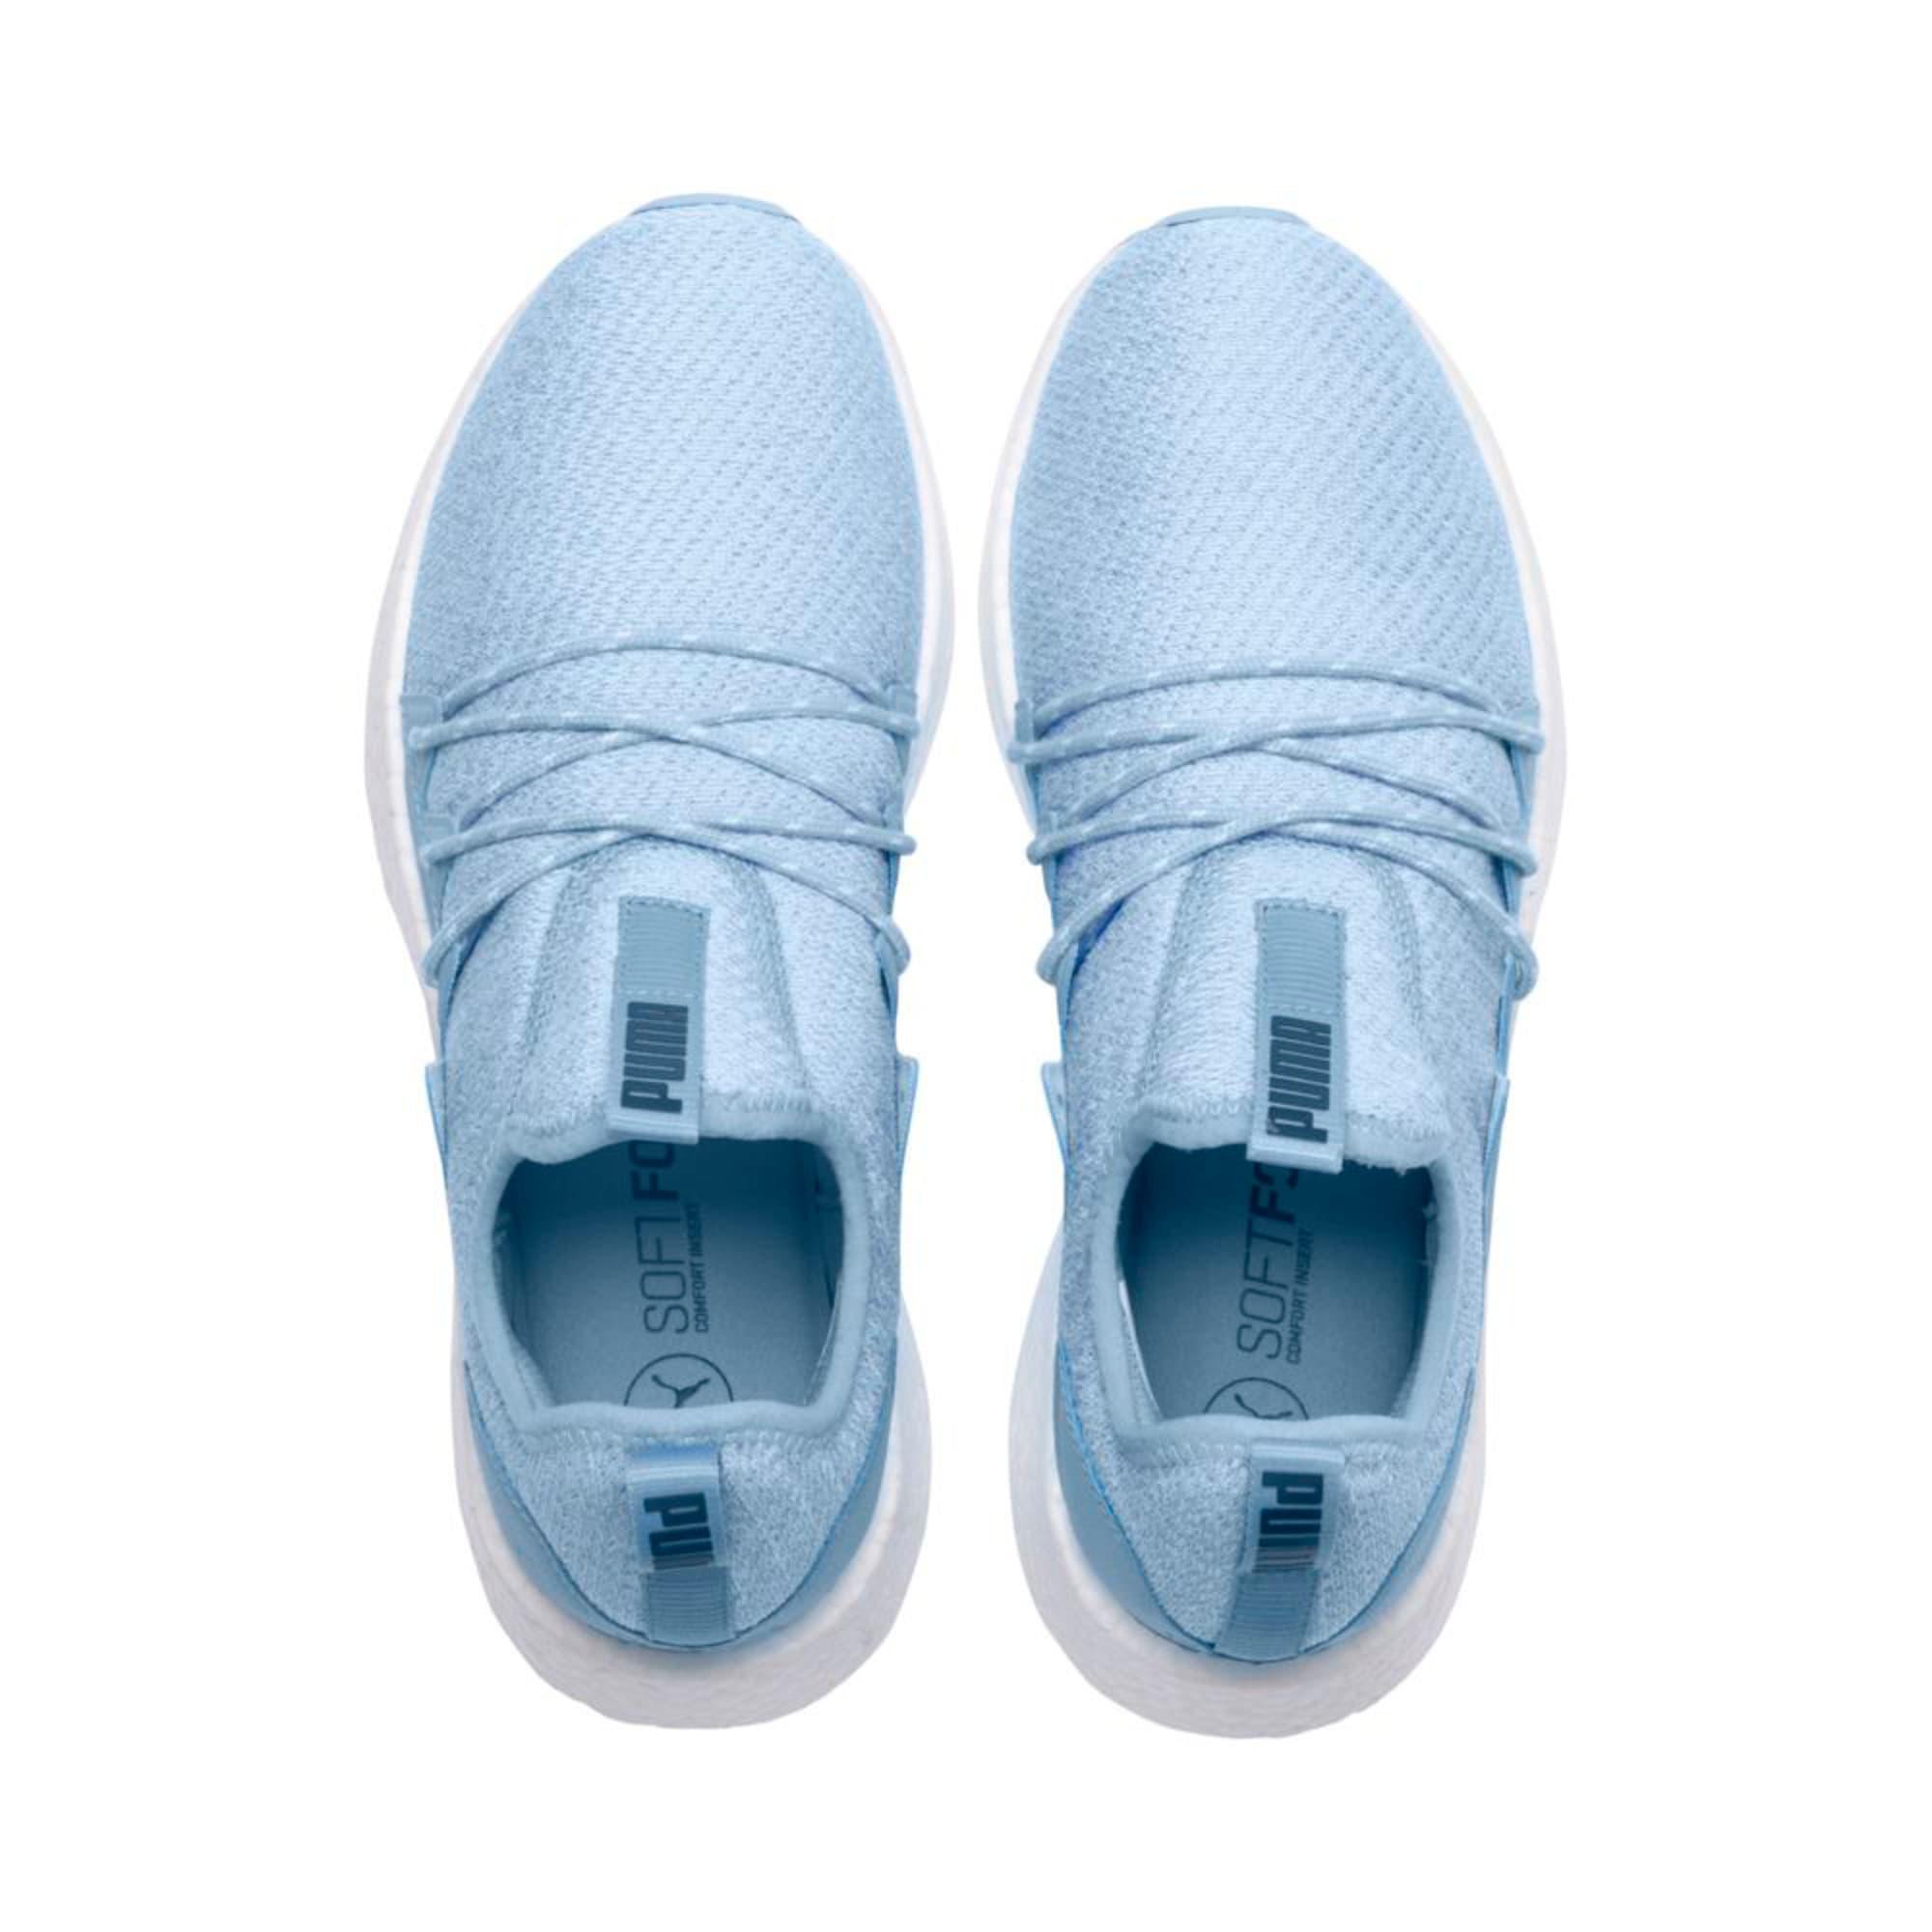 Thumbnail 3 of NRGY Neko Knit Women's Running Shoes, CERULEAN-Peacoat, medium-IND